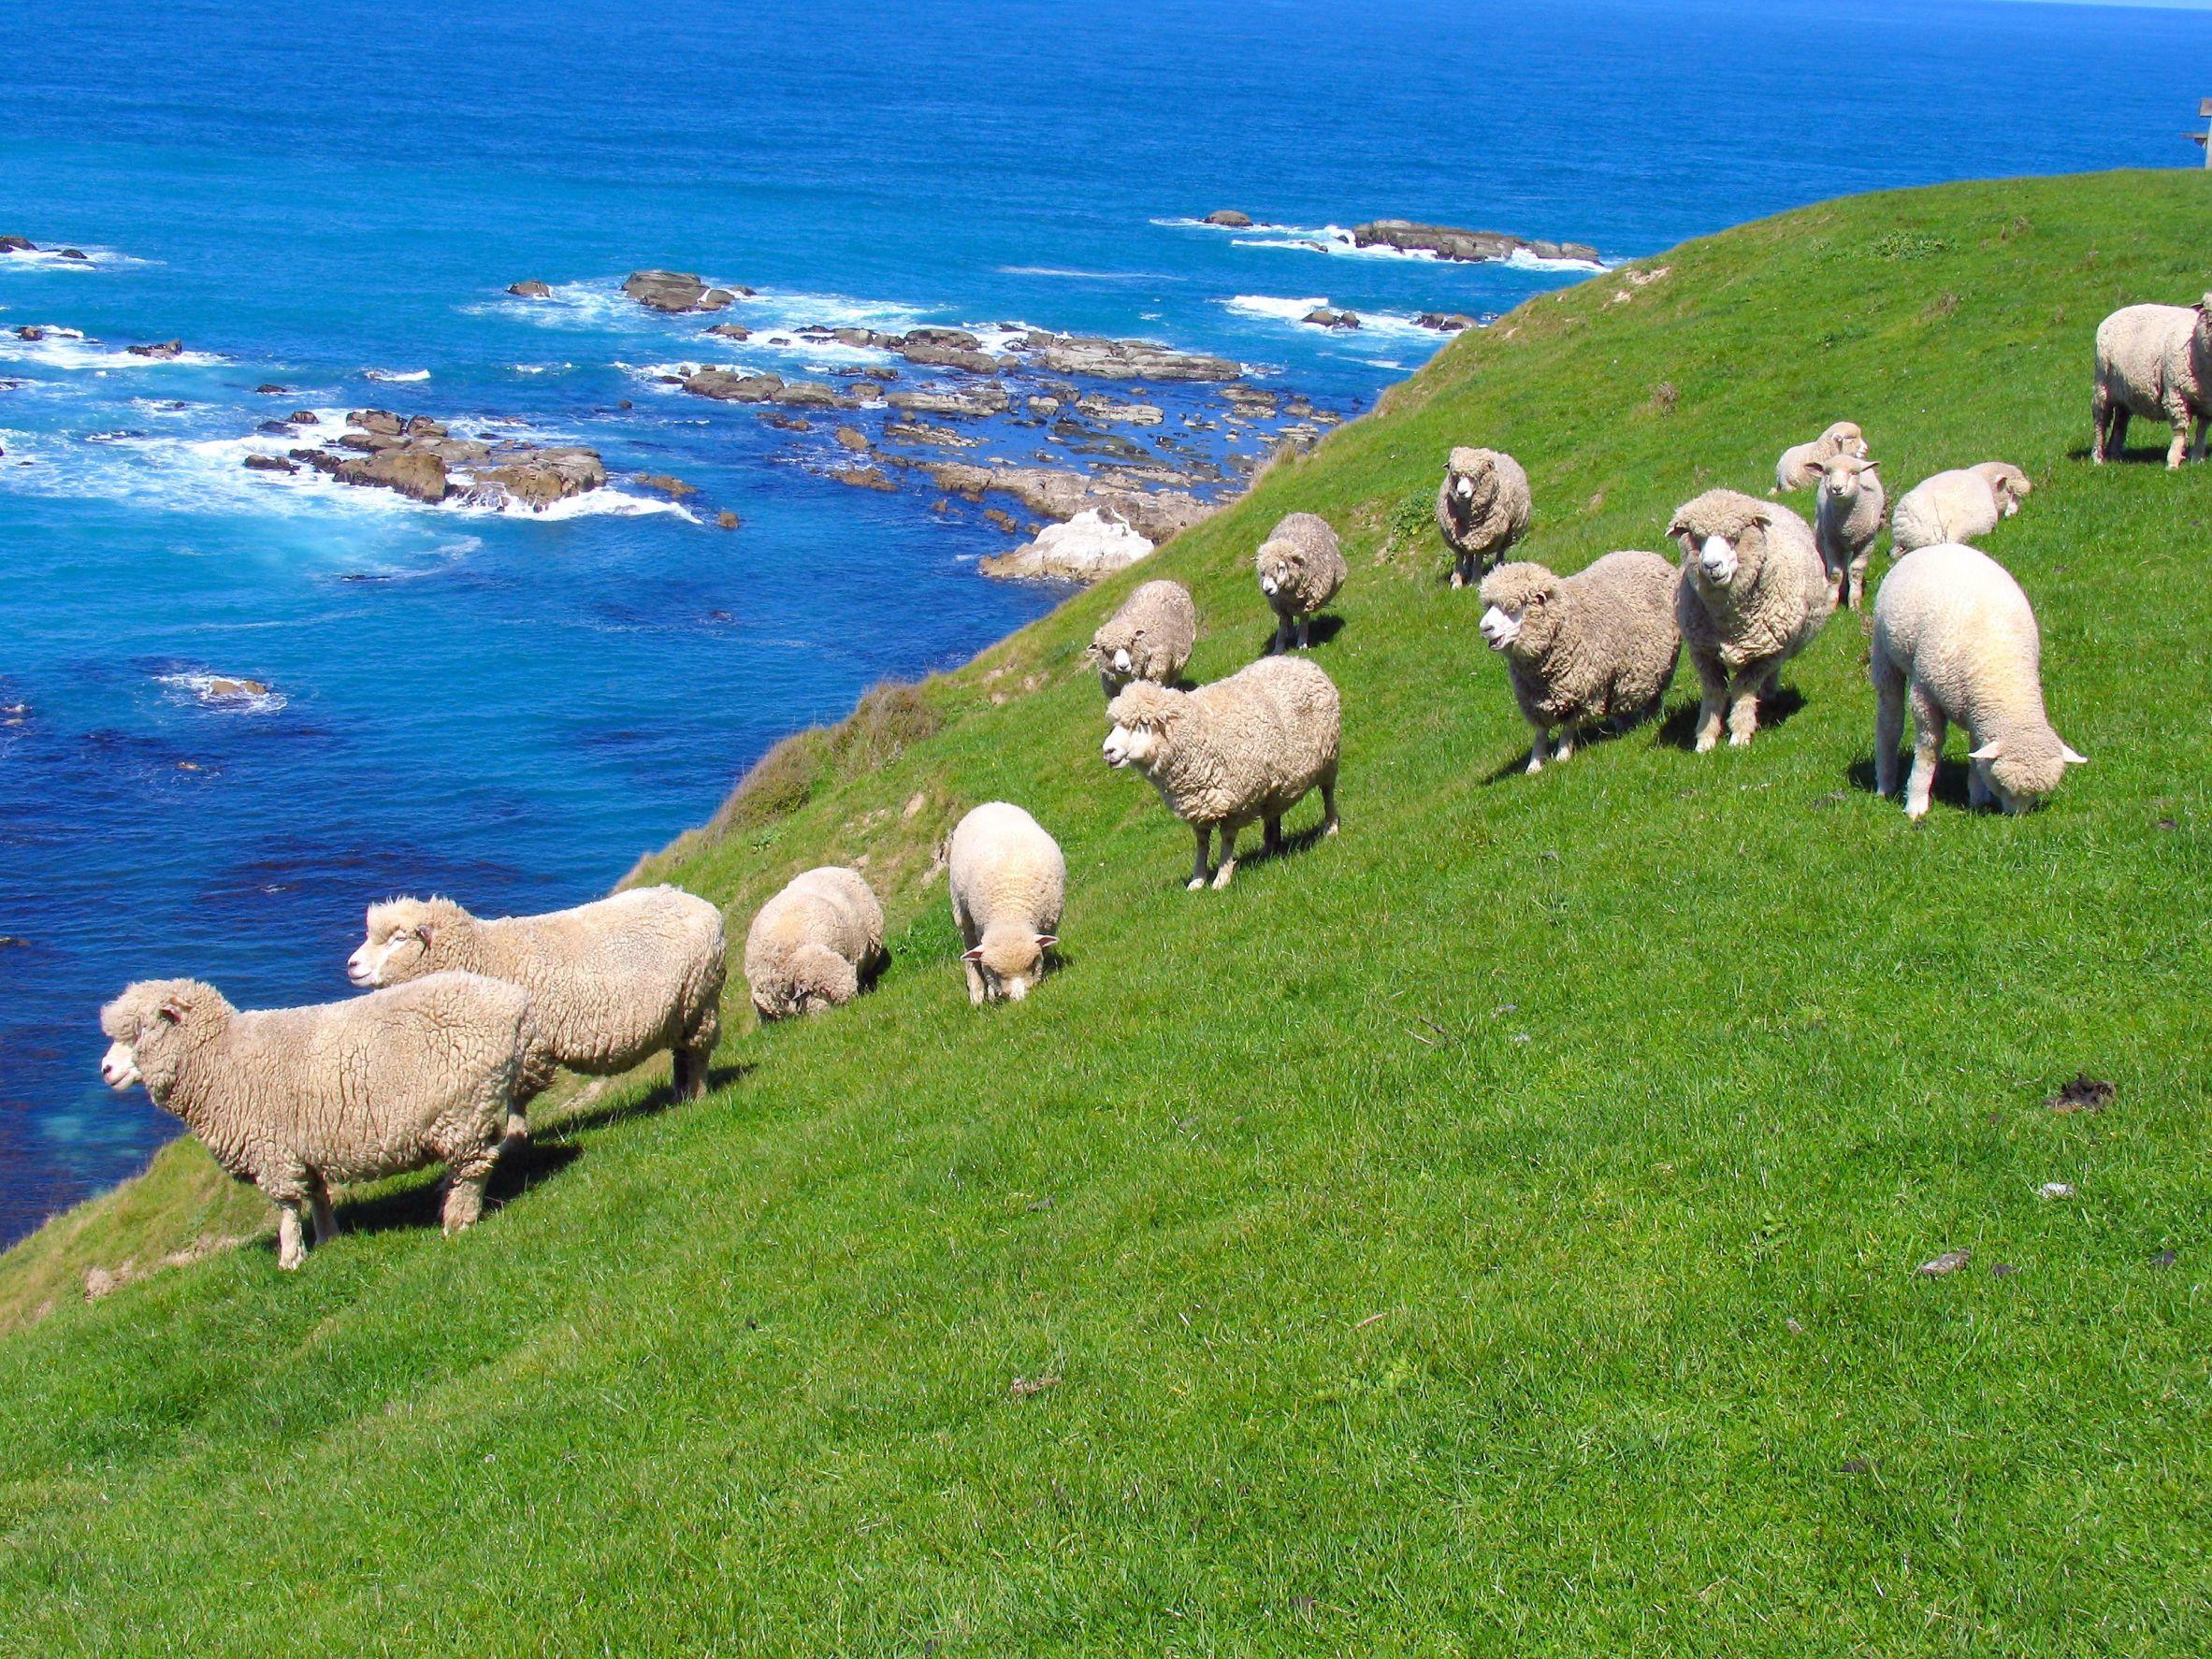 new zealand sheep 123rf